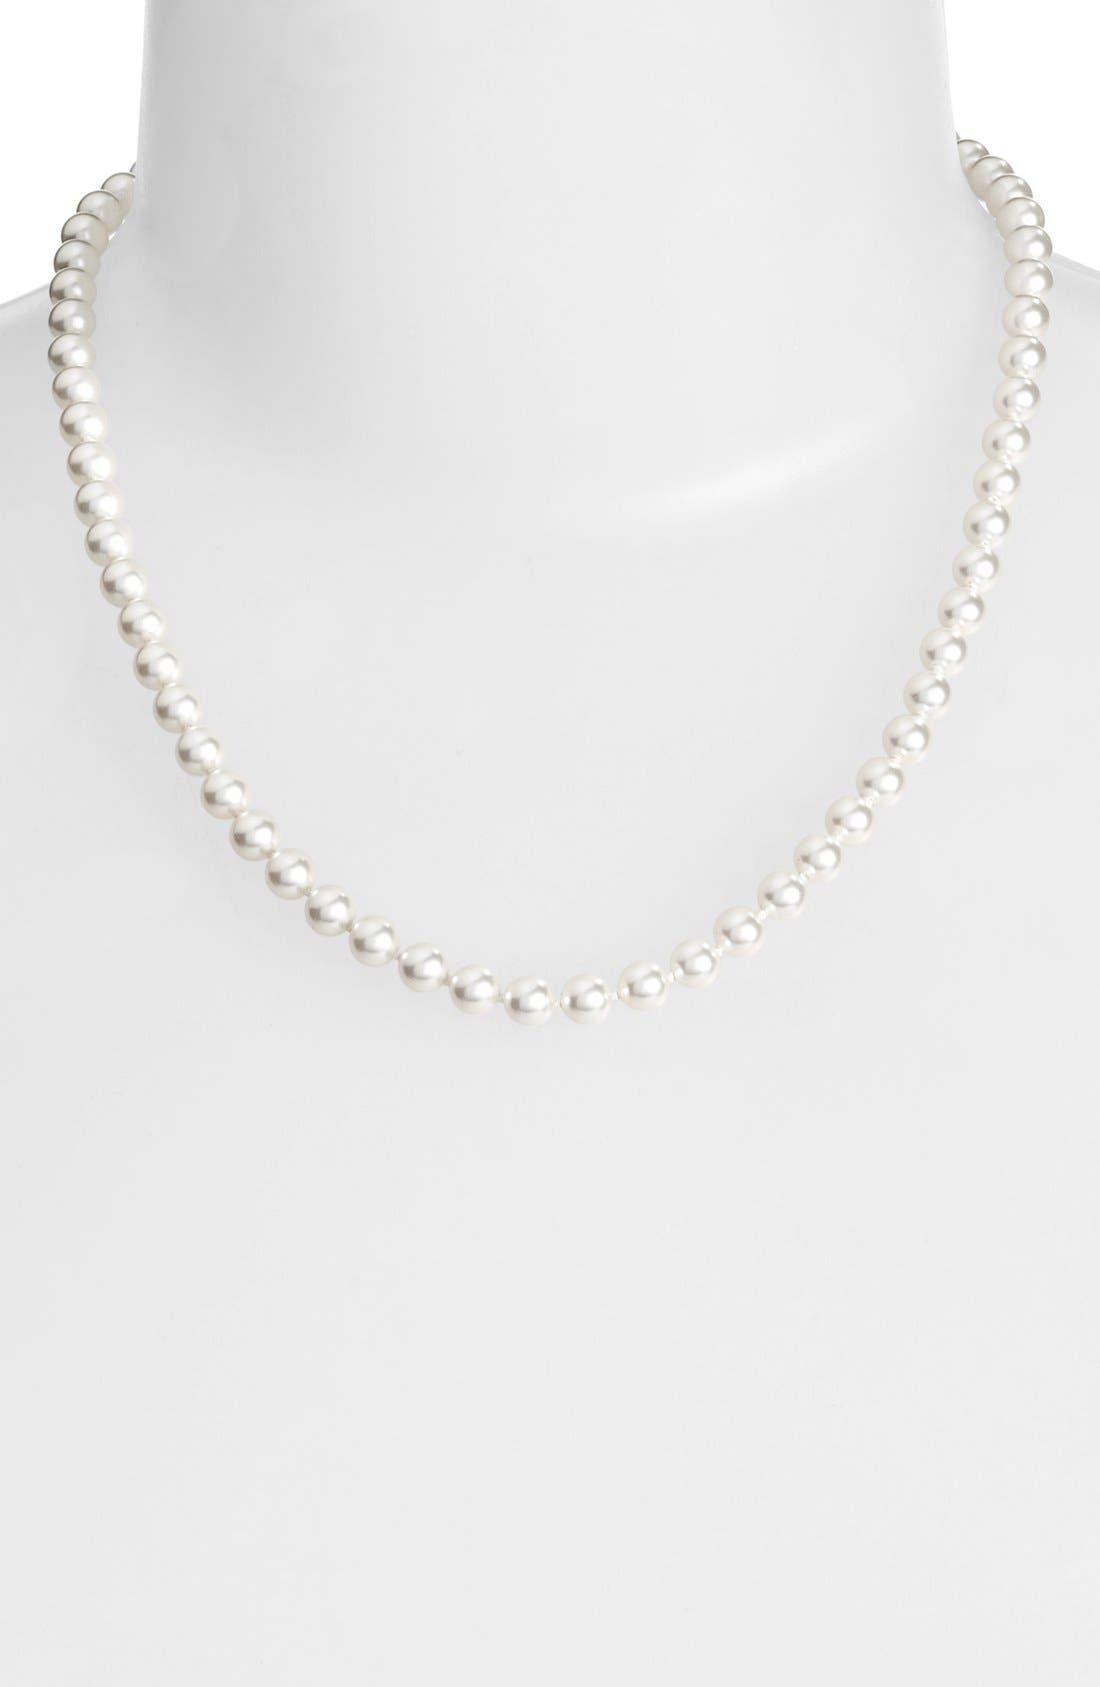 ImitationPearl Collar Necklace,                         Main,                         color, Rhodium